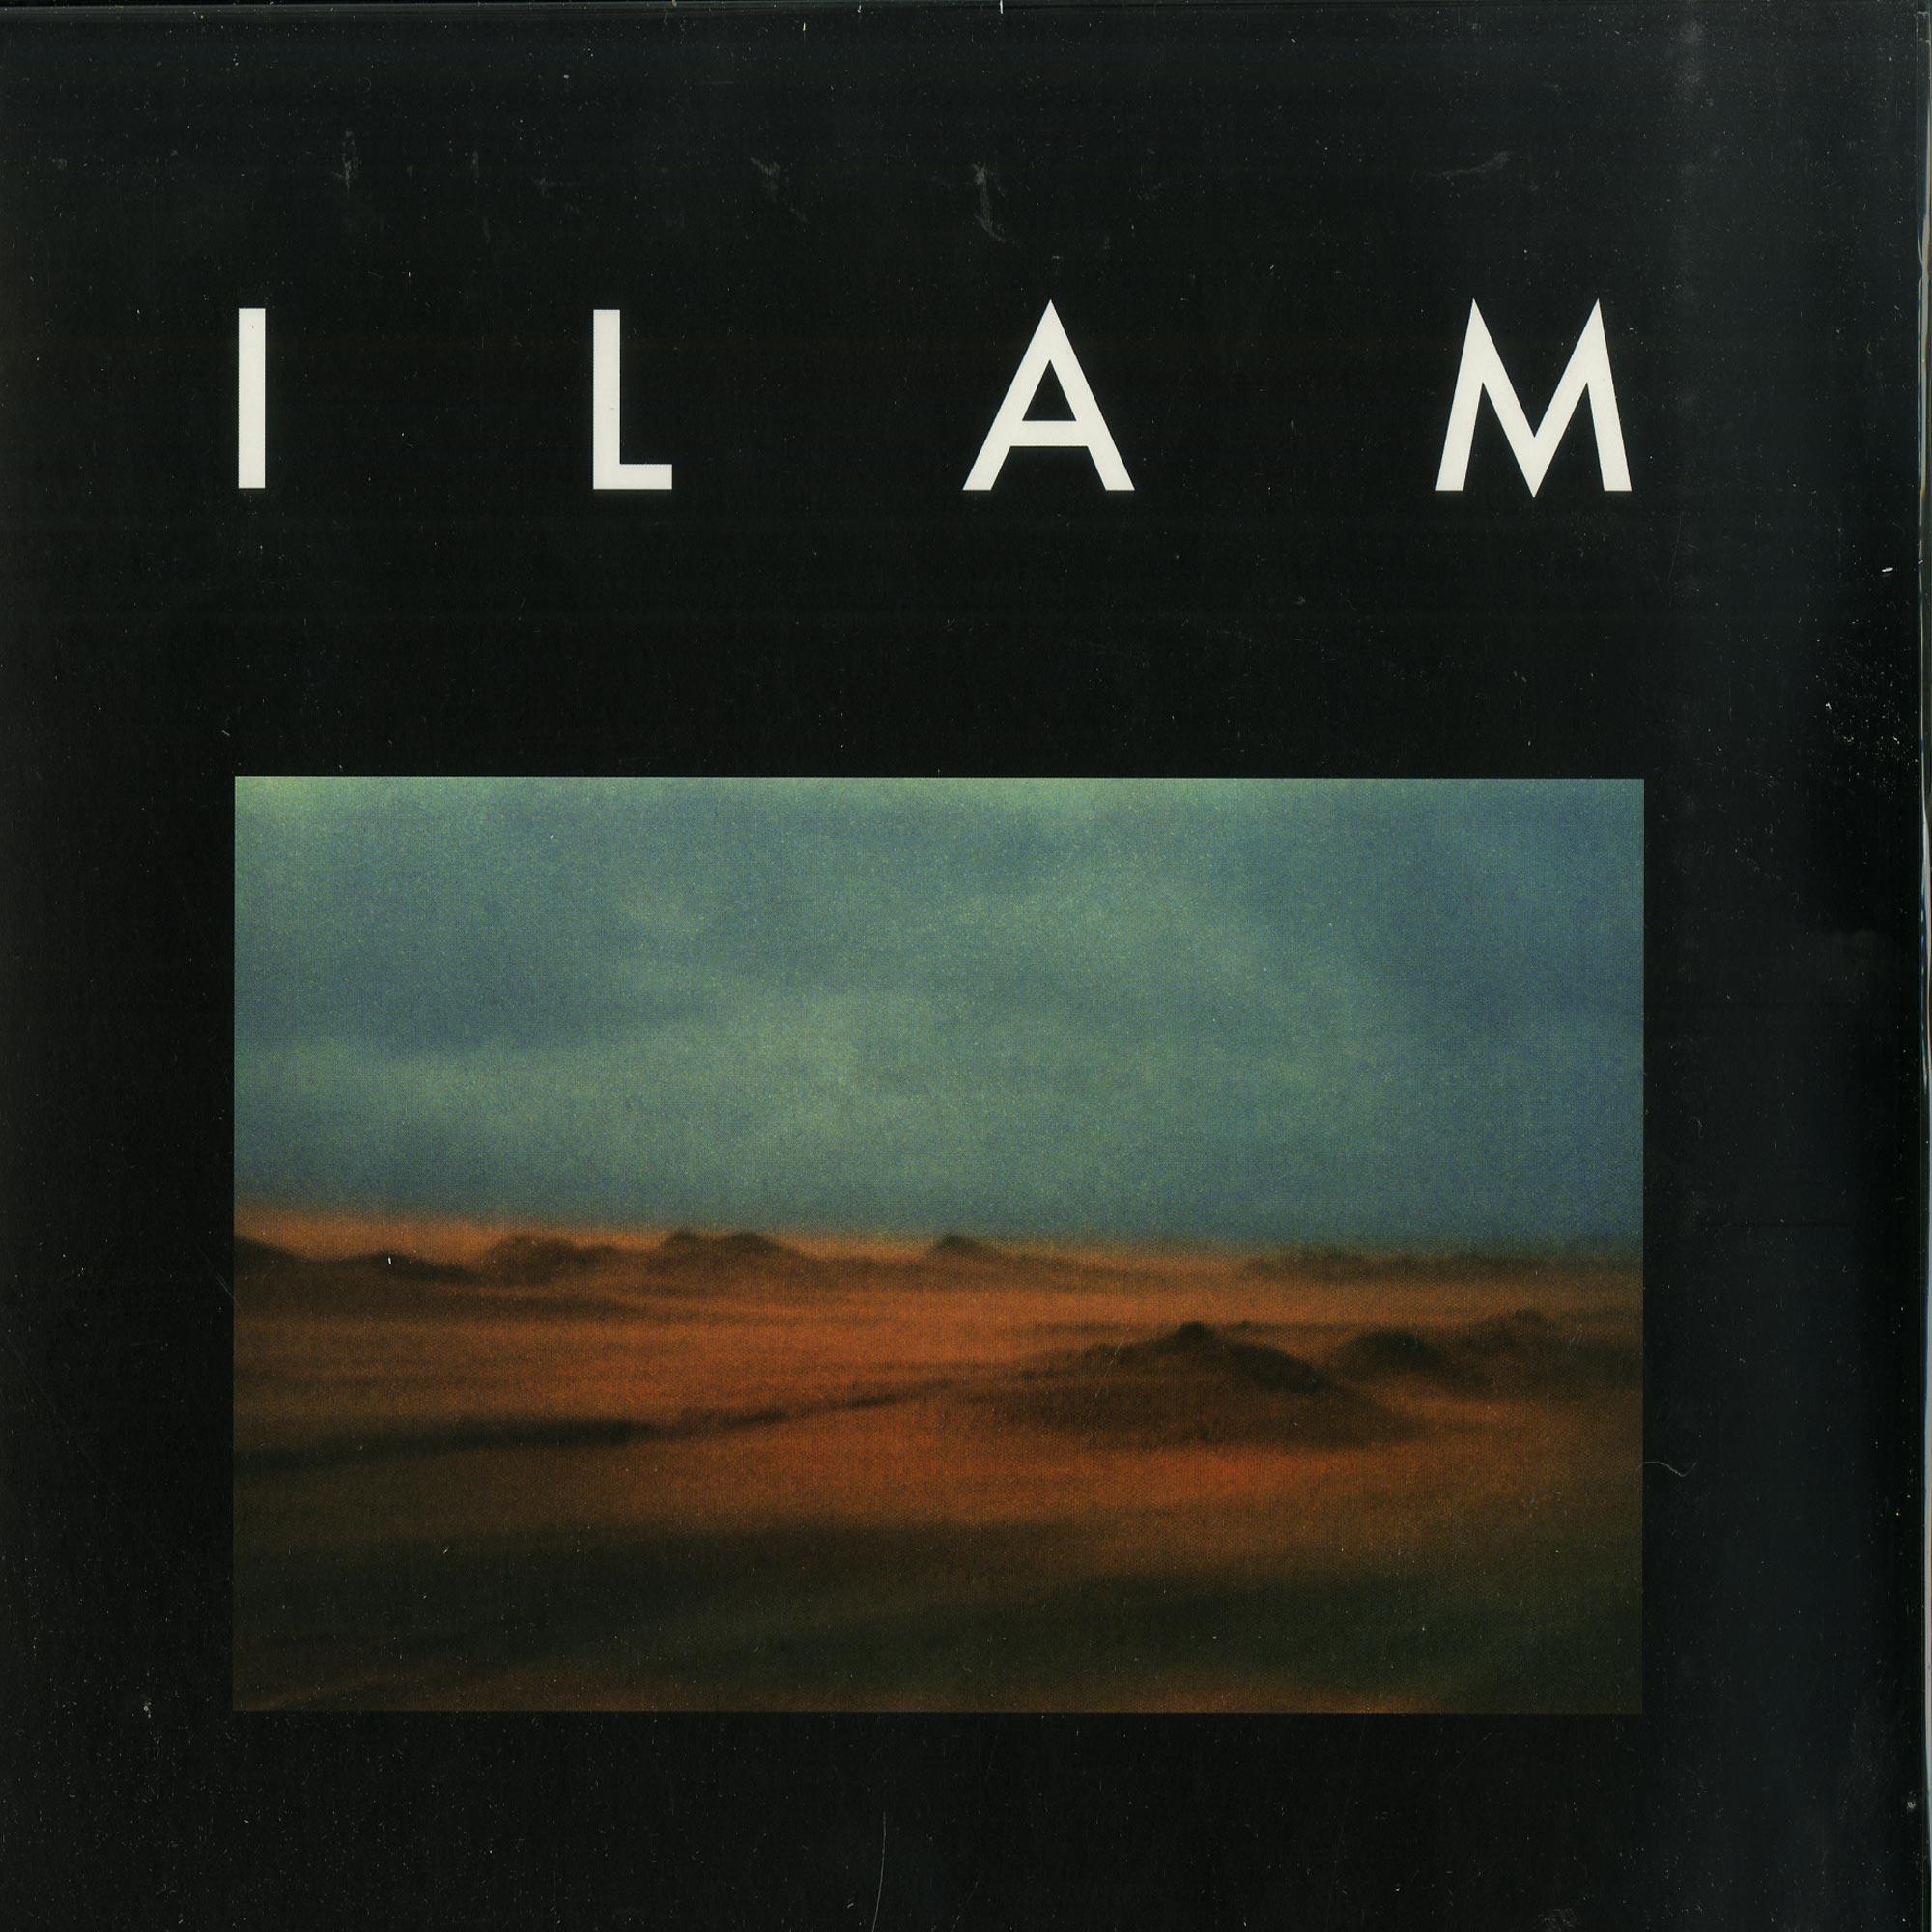 Kosmo Sound - ILAM / ILAM DUB